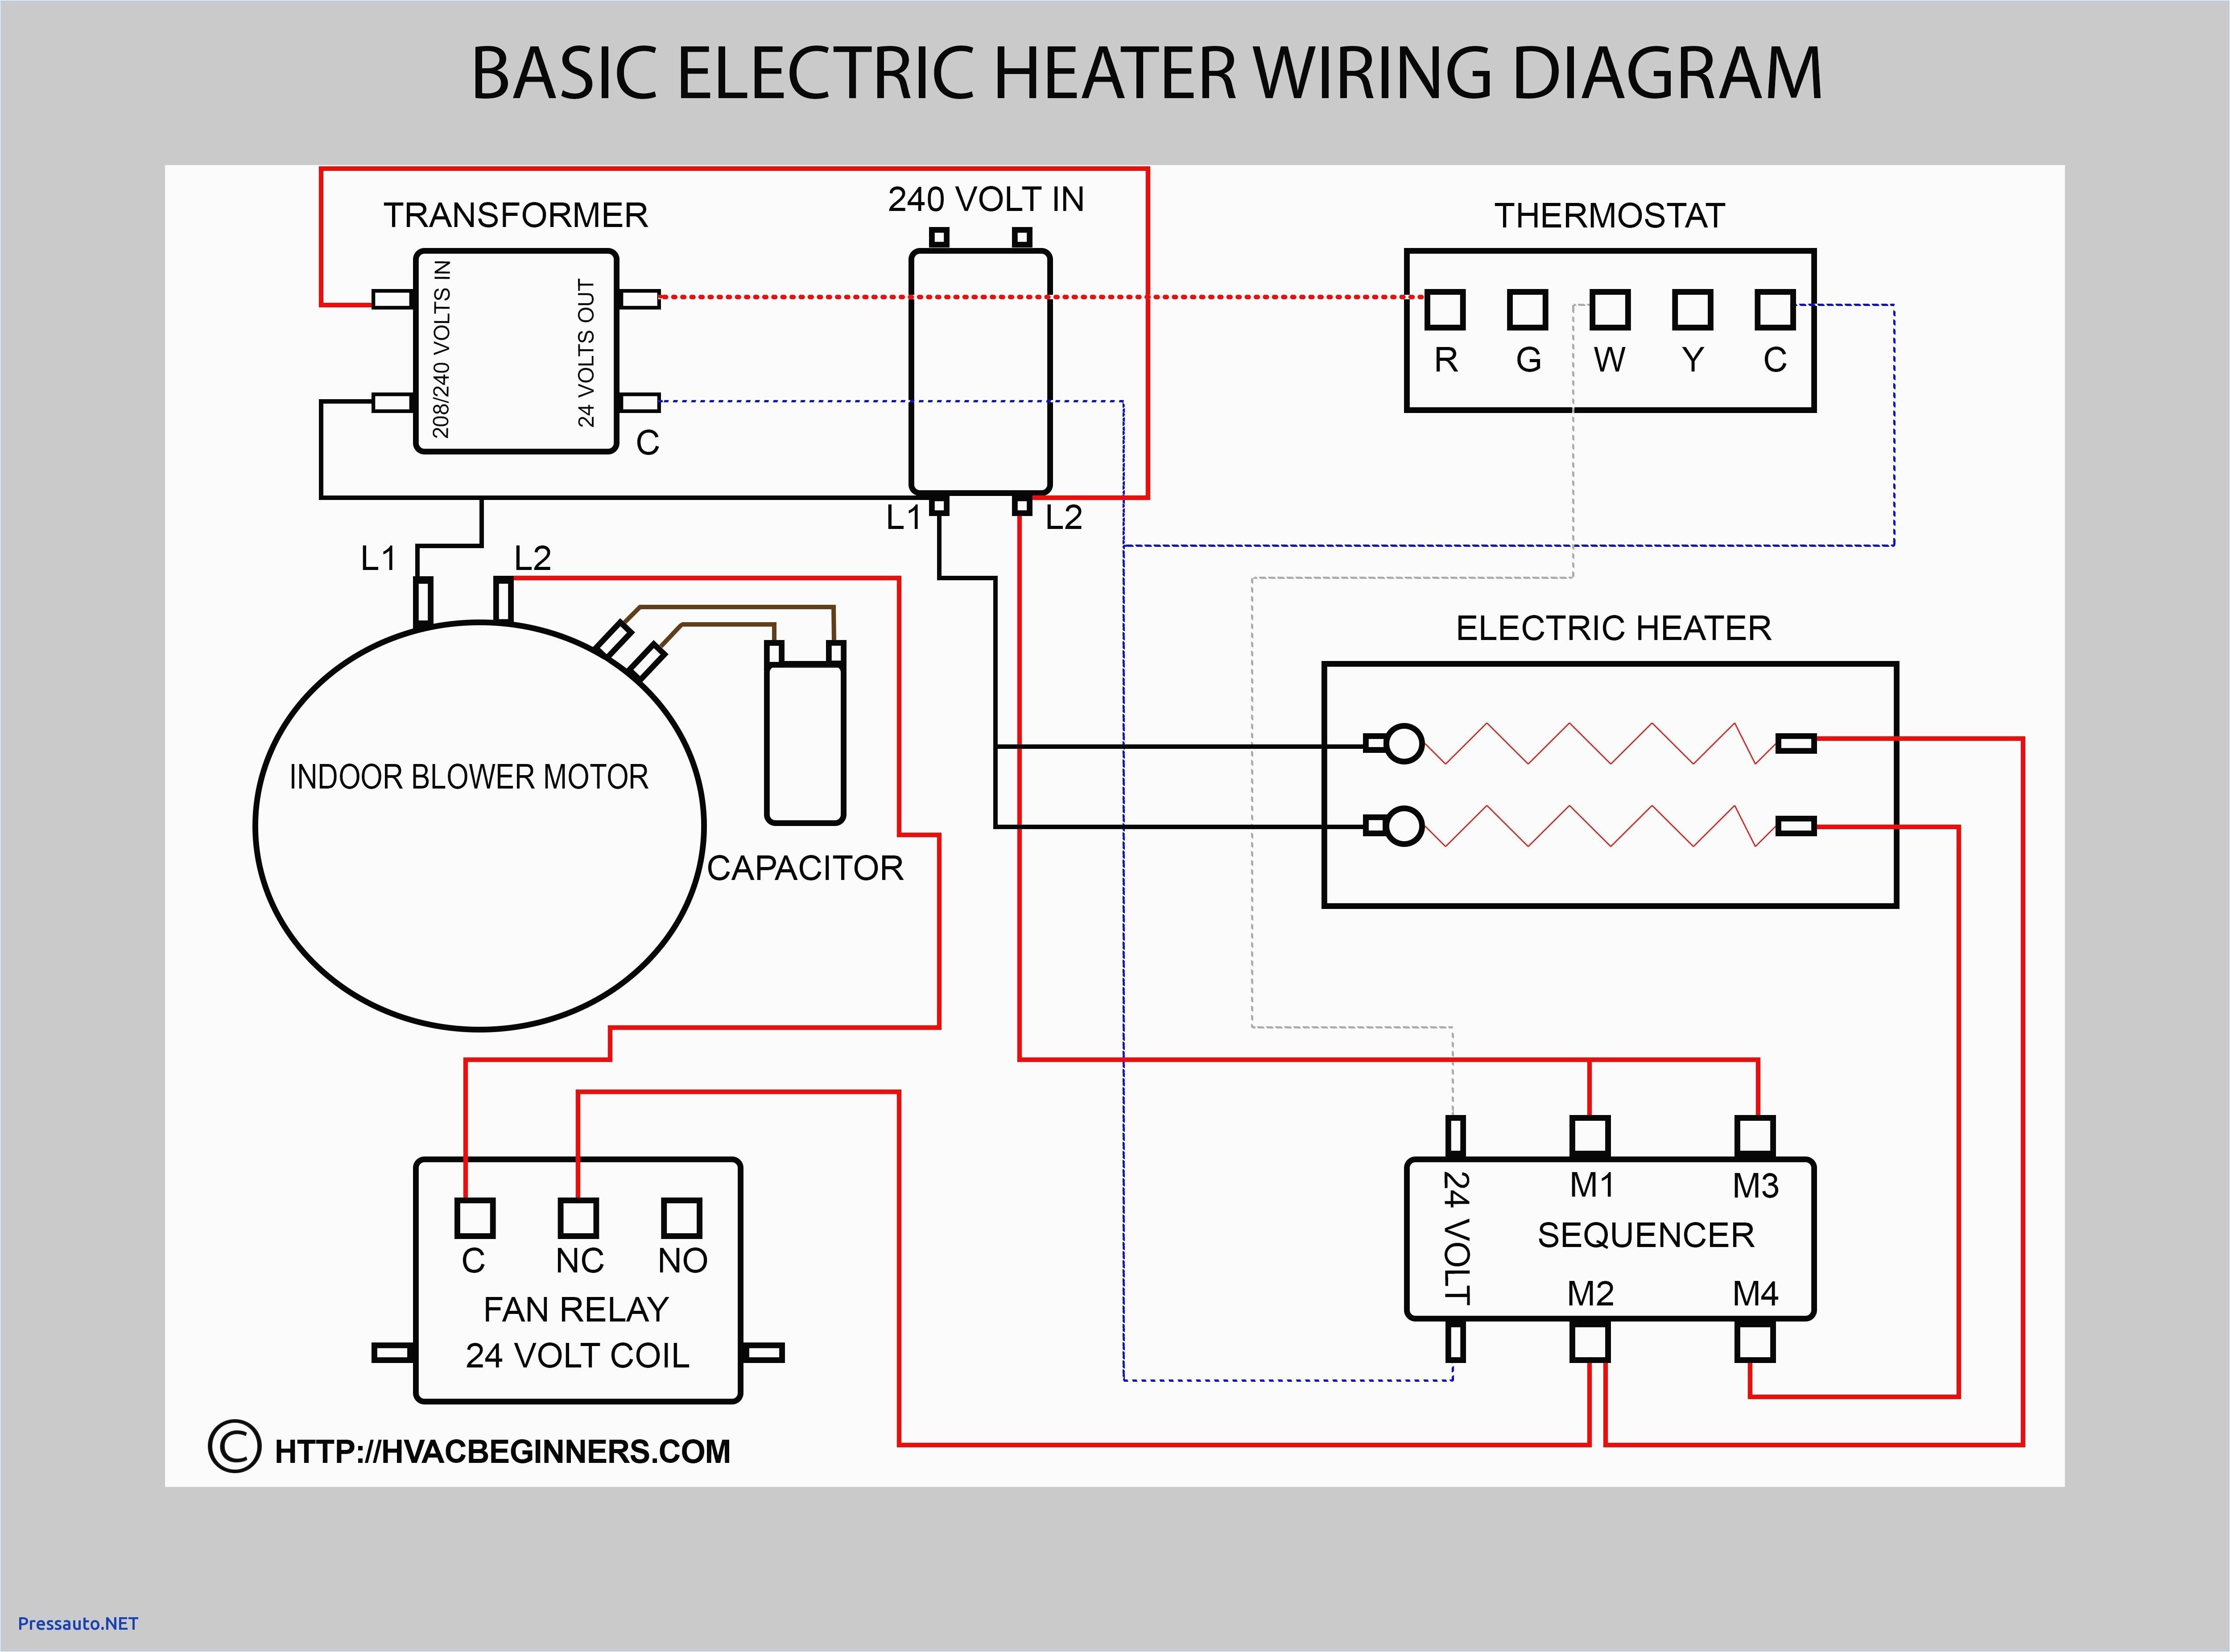 hunter 44360 wiring diagram new wiring diagram additionally hunter thermostat wiring diagram wire